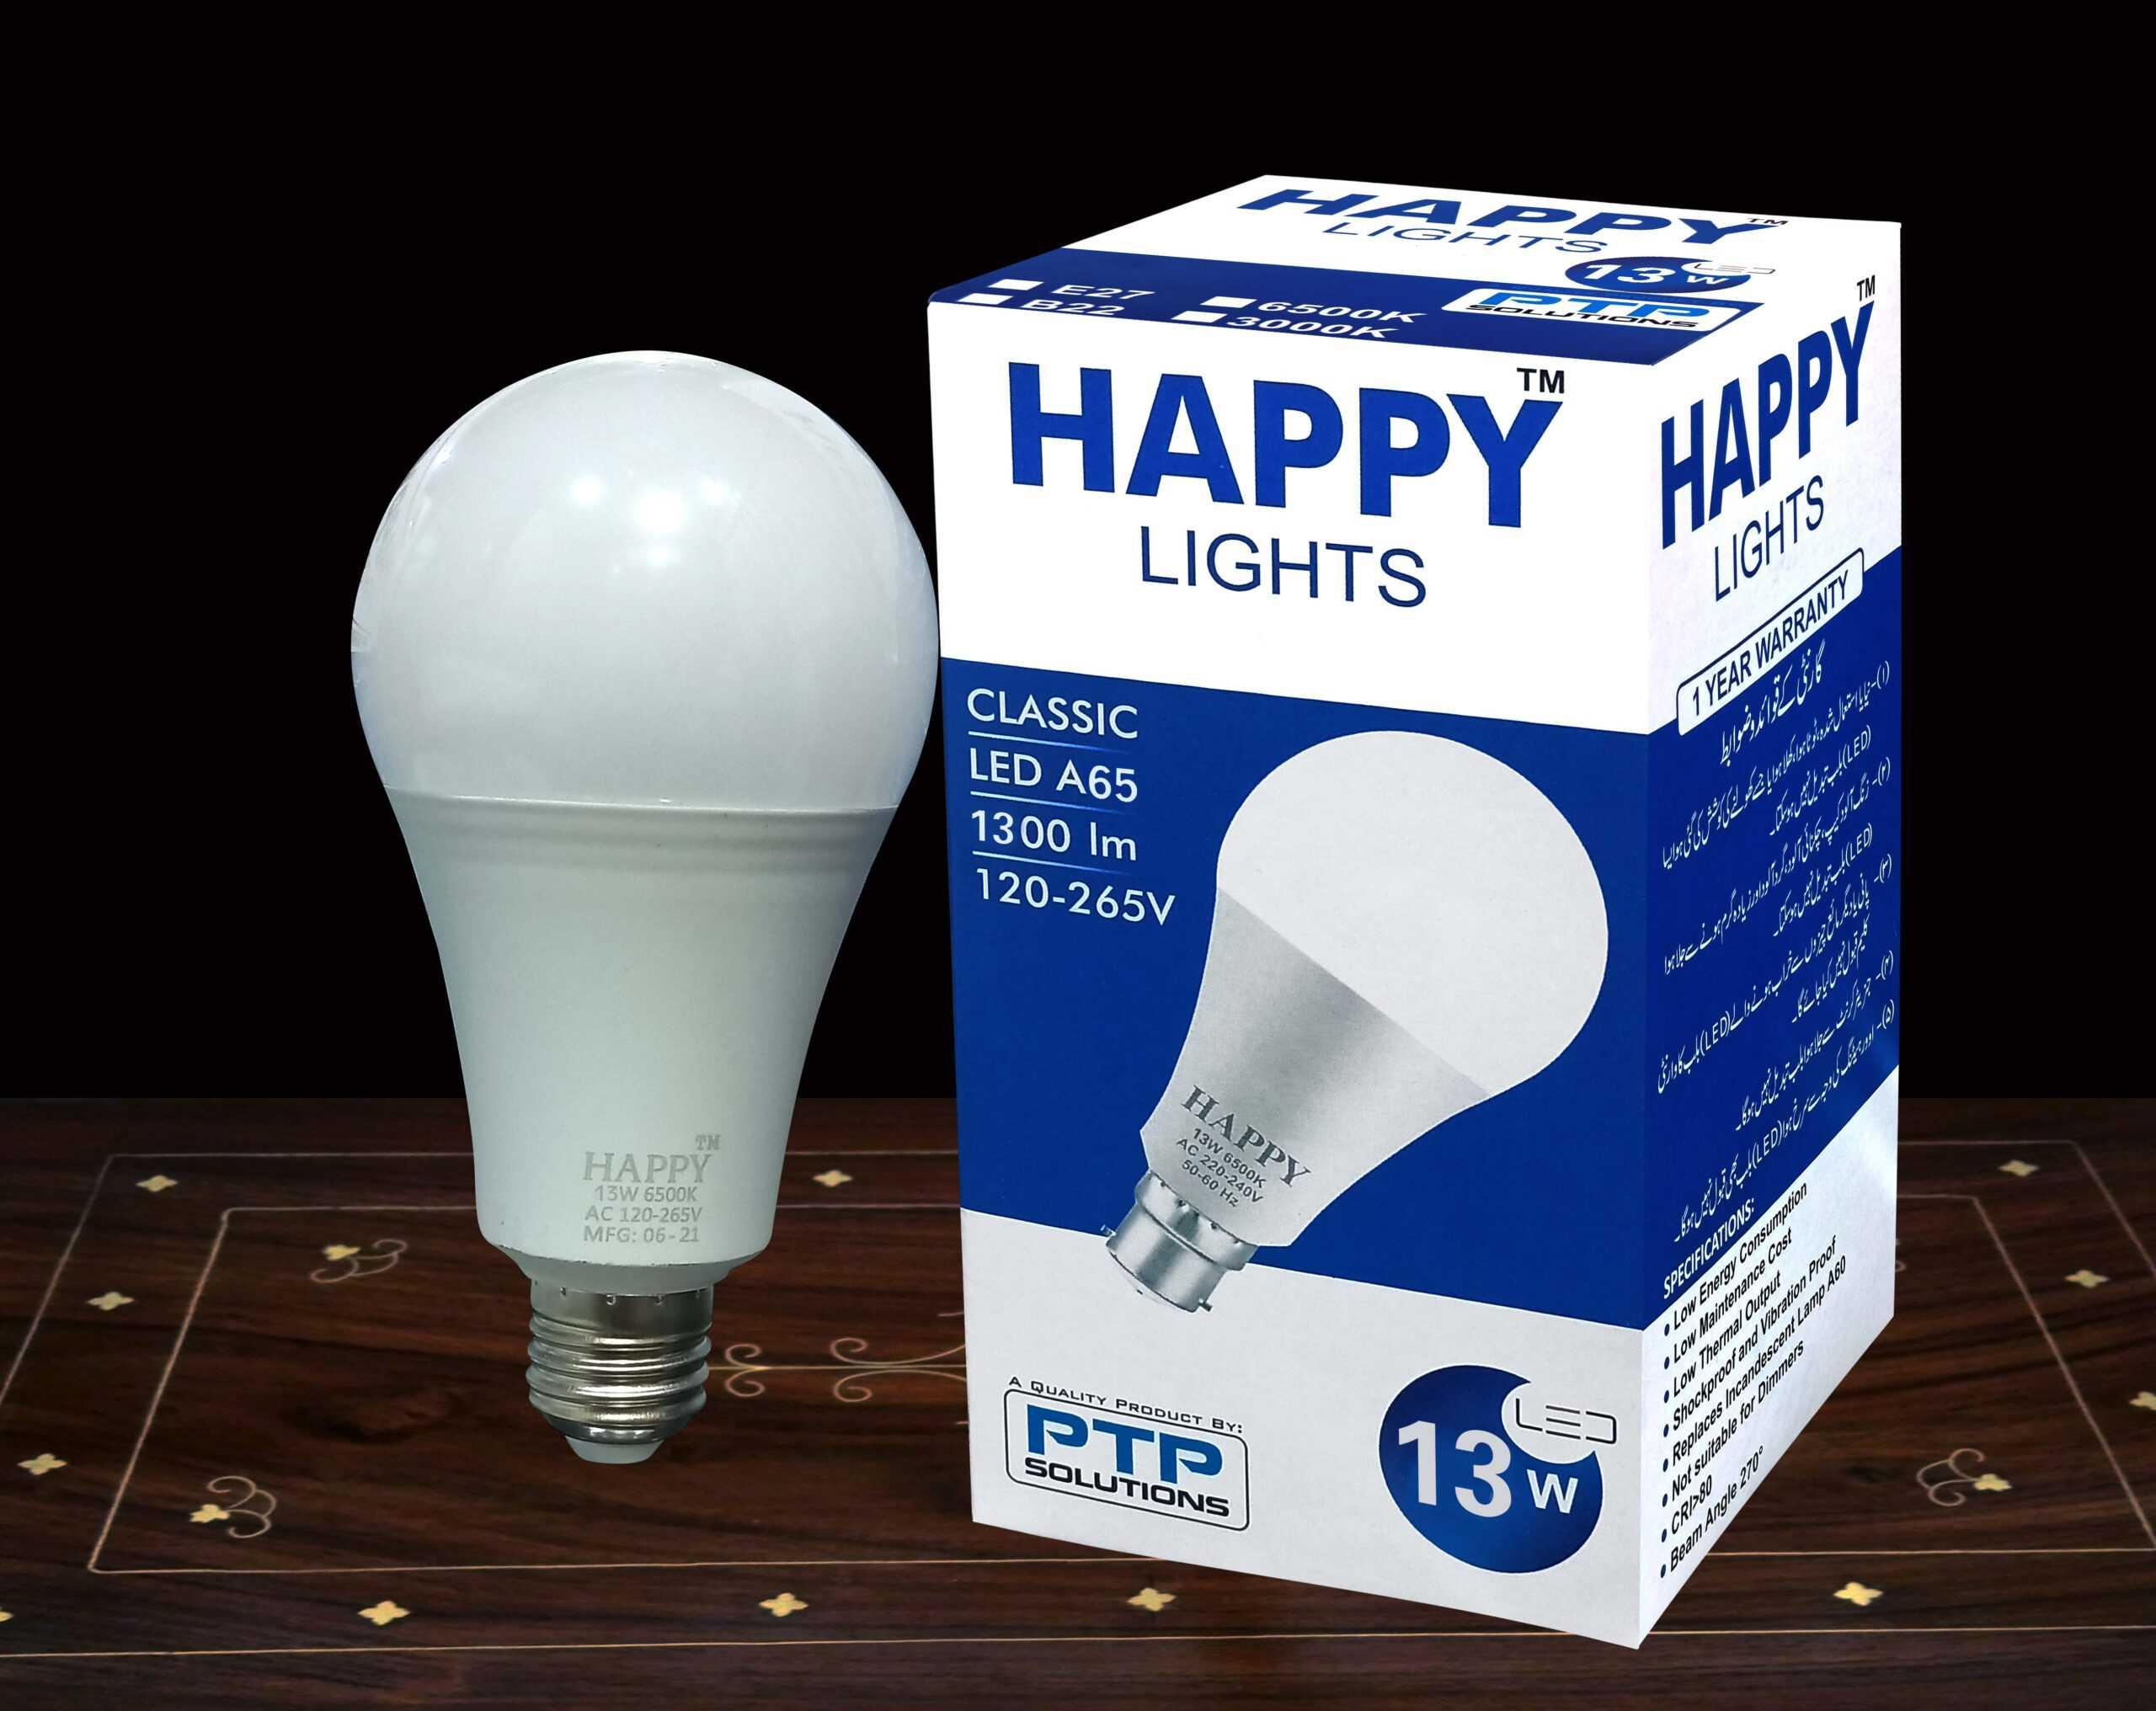 13 WAAT LED Bulb Price in Pakistan | My Happy Store